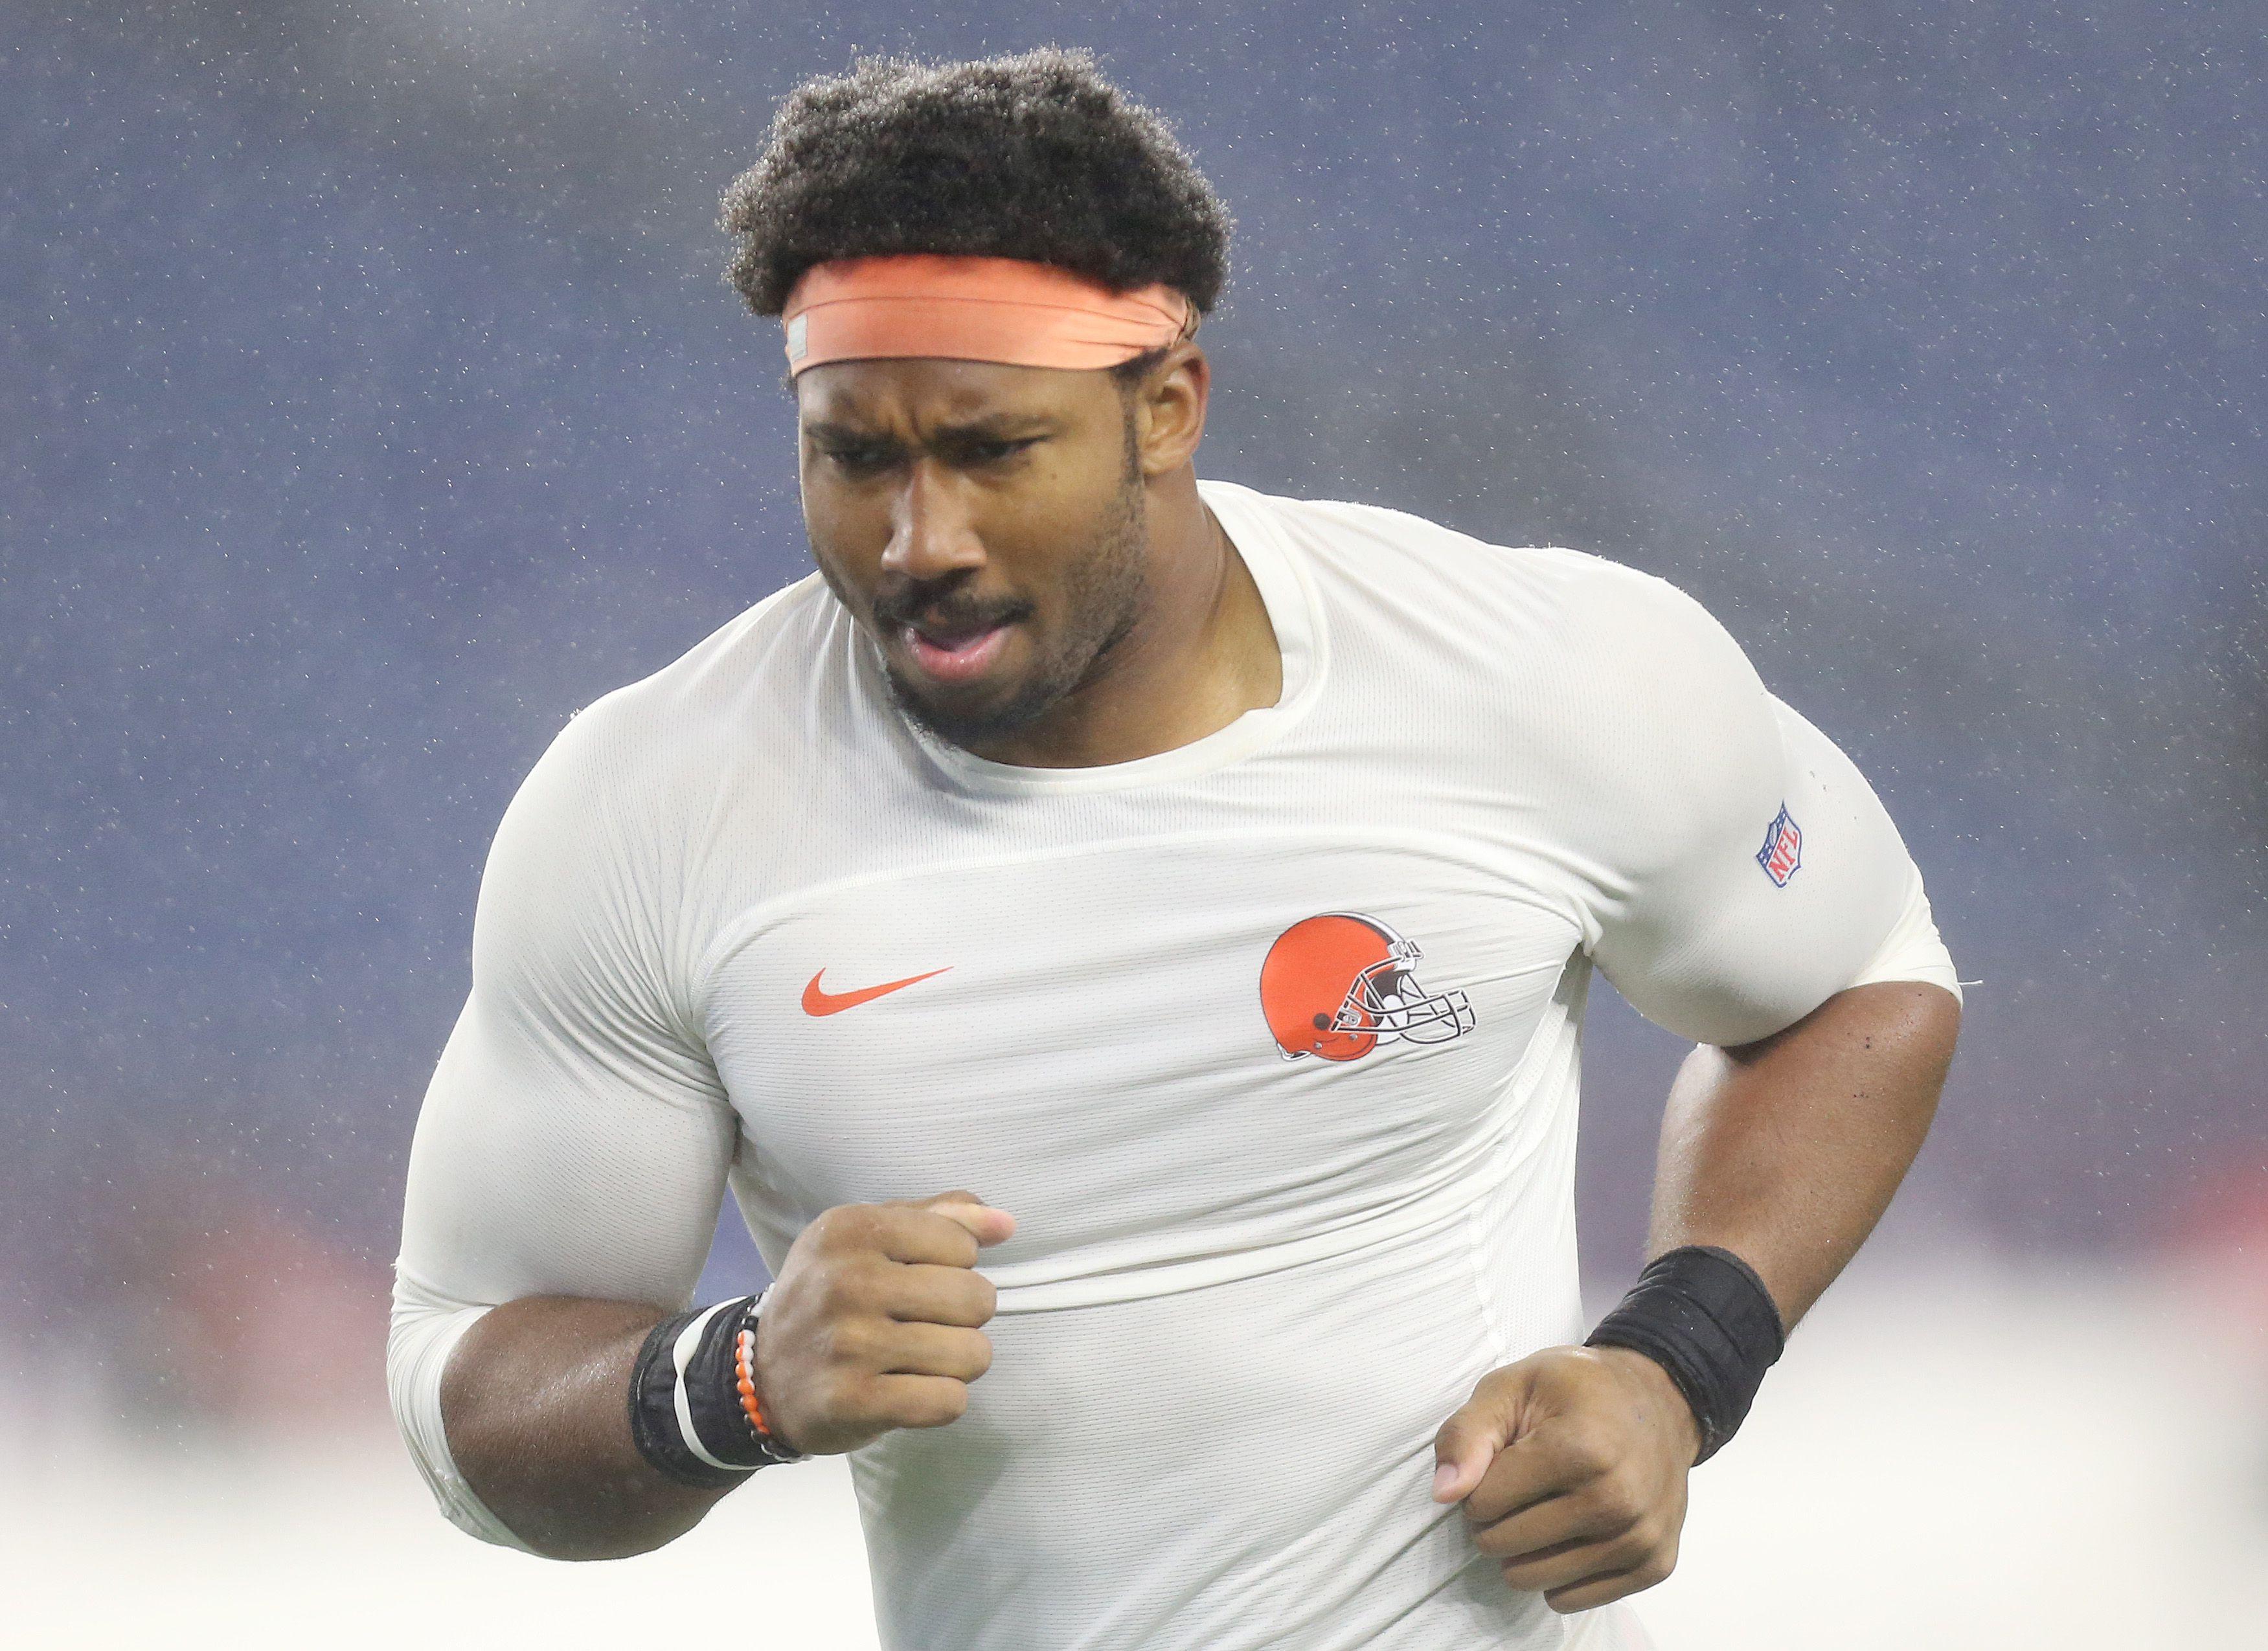 NFL's next richest defensive player That could be Myles Garrett ...